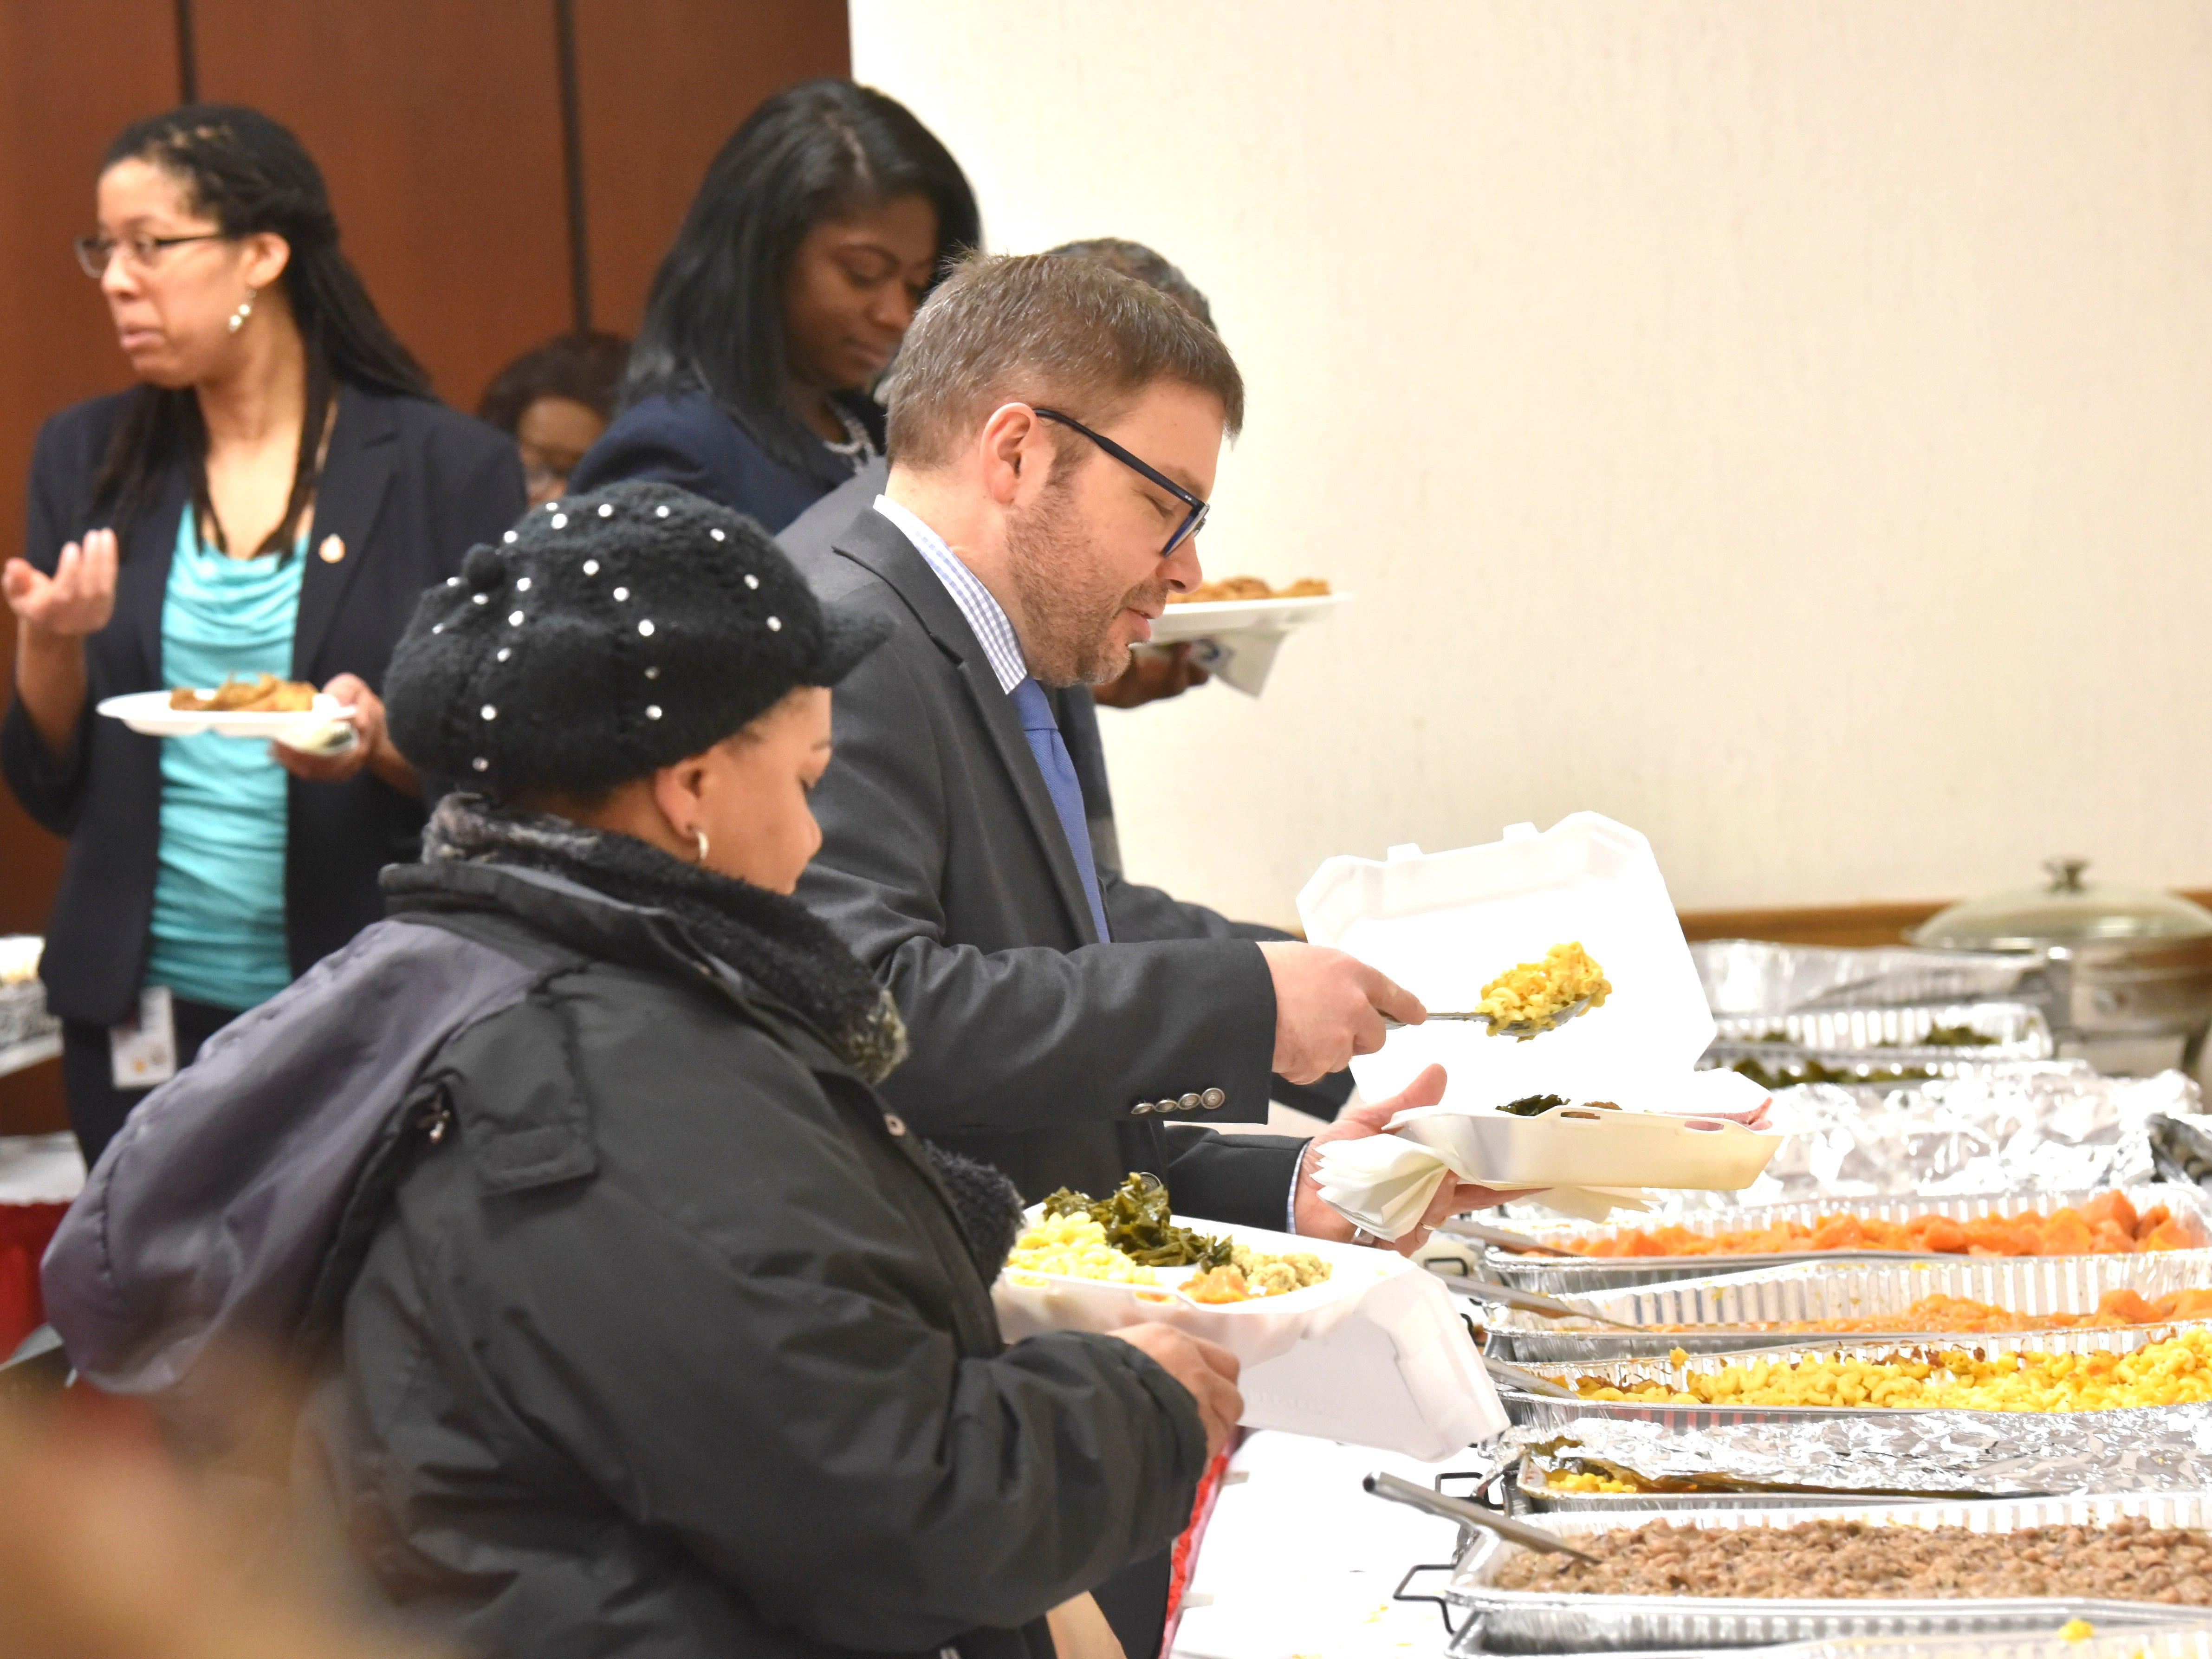 U.S. District Court Magistrate Judge Anthony P. Patti, center, serves himself soul food.